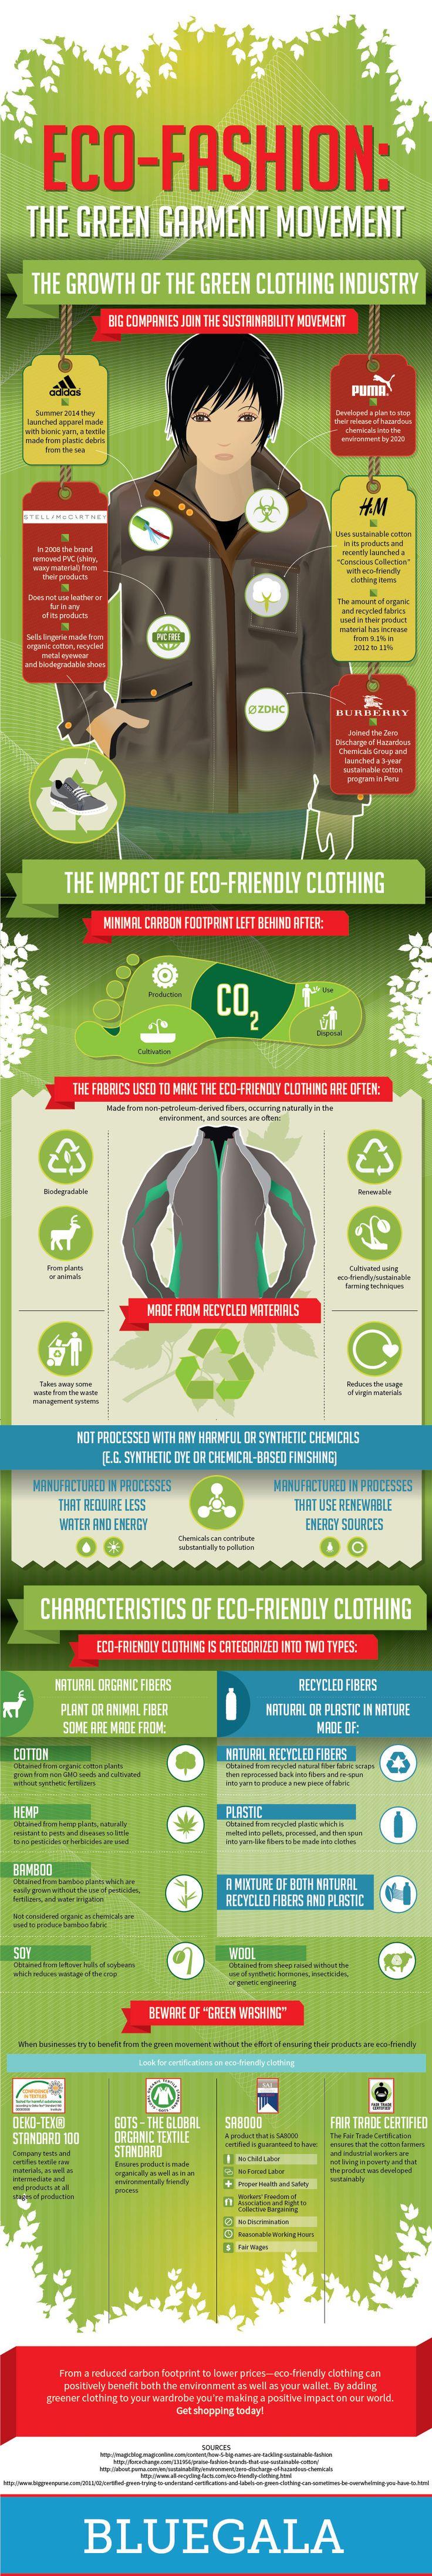 Eco-fashion: The Green Garment Movement #ecofashion #greengarmentmovement